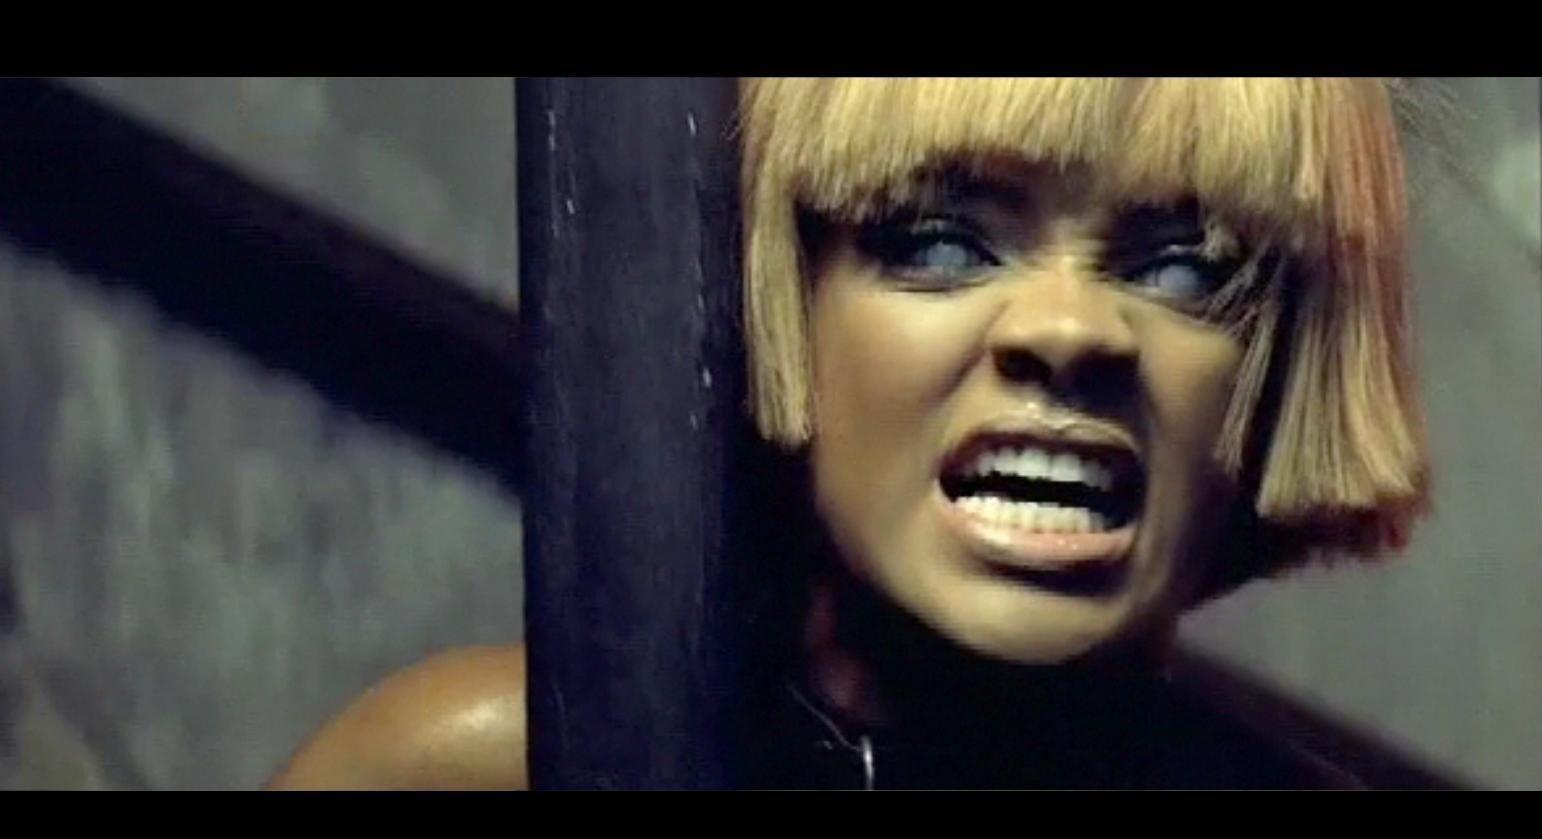 Rihanna disturbia video demon possesion illuminati symbolism rihanna disturbia video demon possesion illuminati symbolism ingilizce ark szleri arkszleri biocorpaavc Choice Image